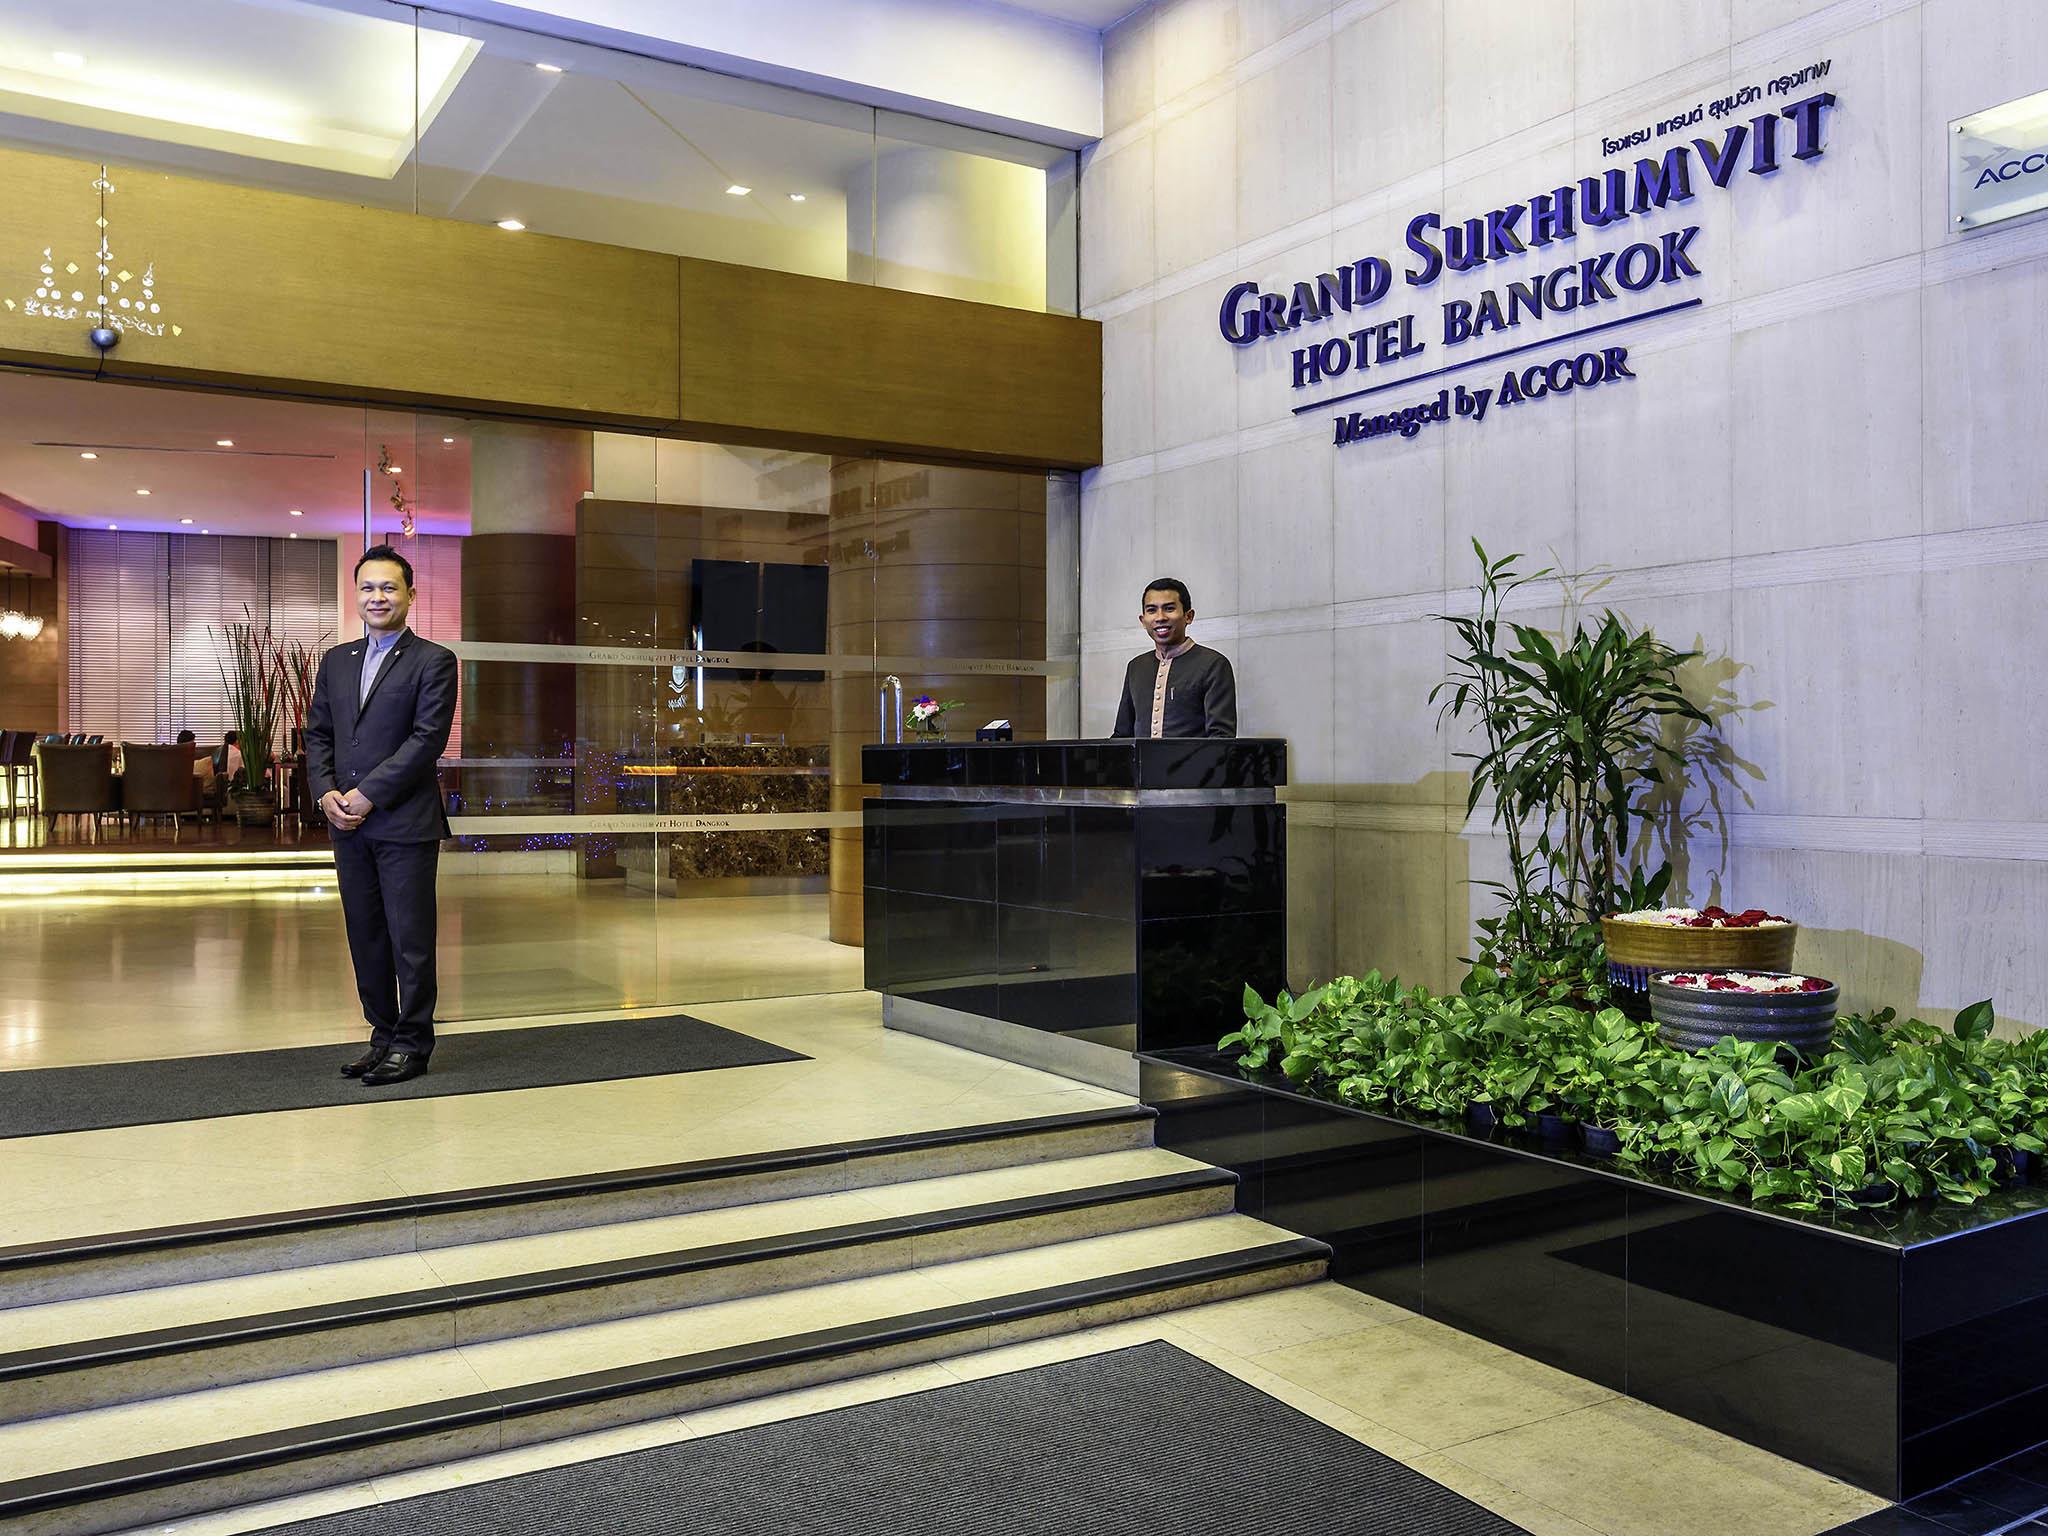 Hotel Grand Sukhumvit Bangkok